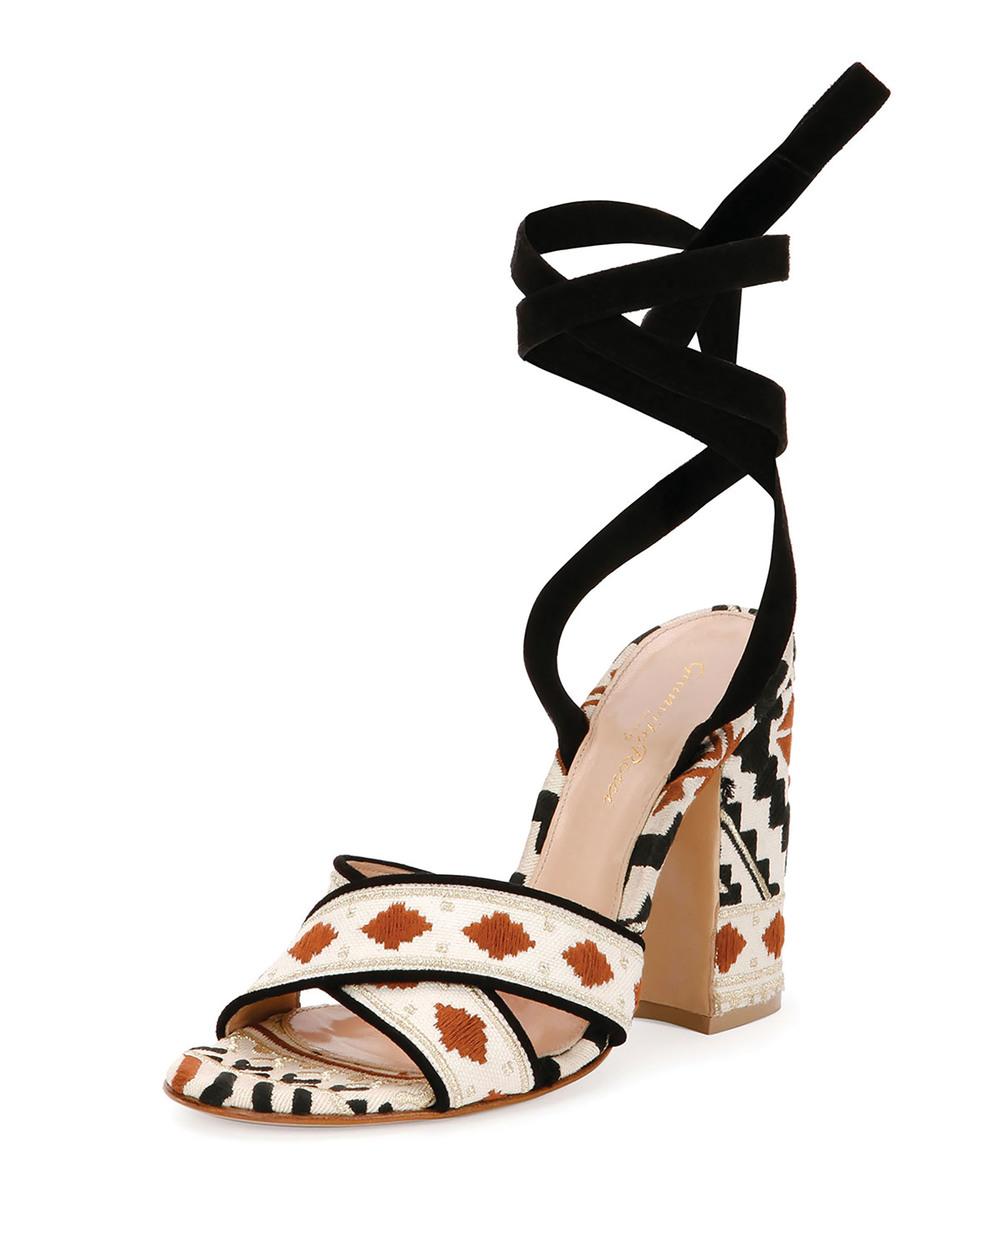 Gianvito Rossi Embroidered Open Toe Crisscross Sandal $1,656